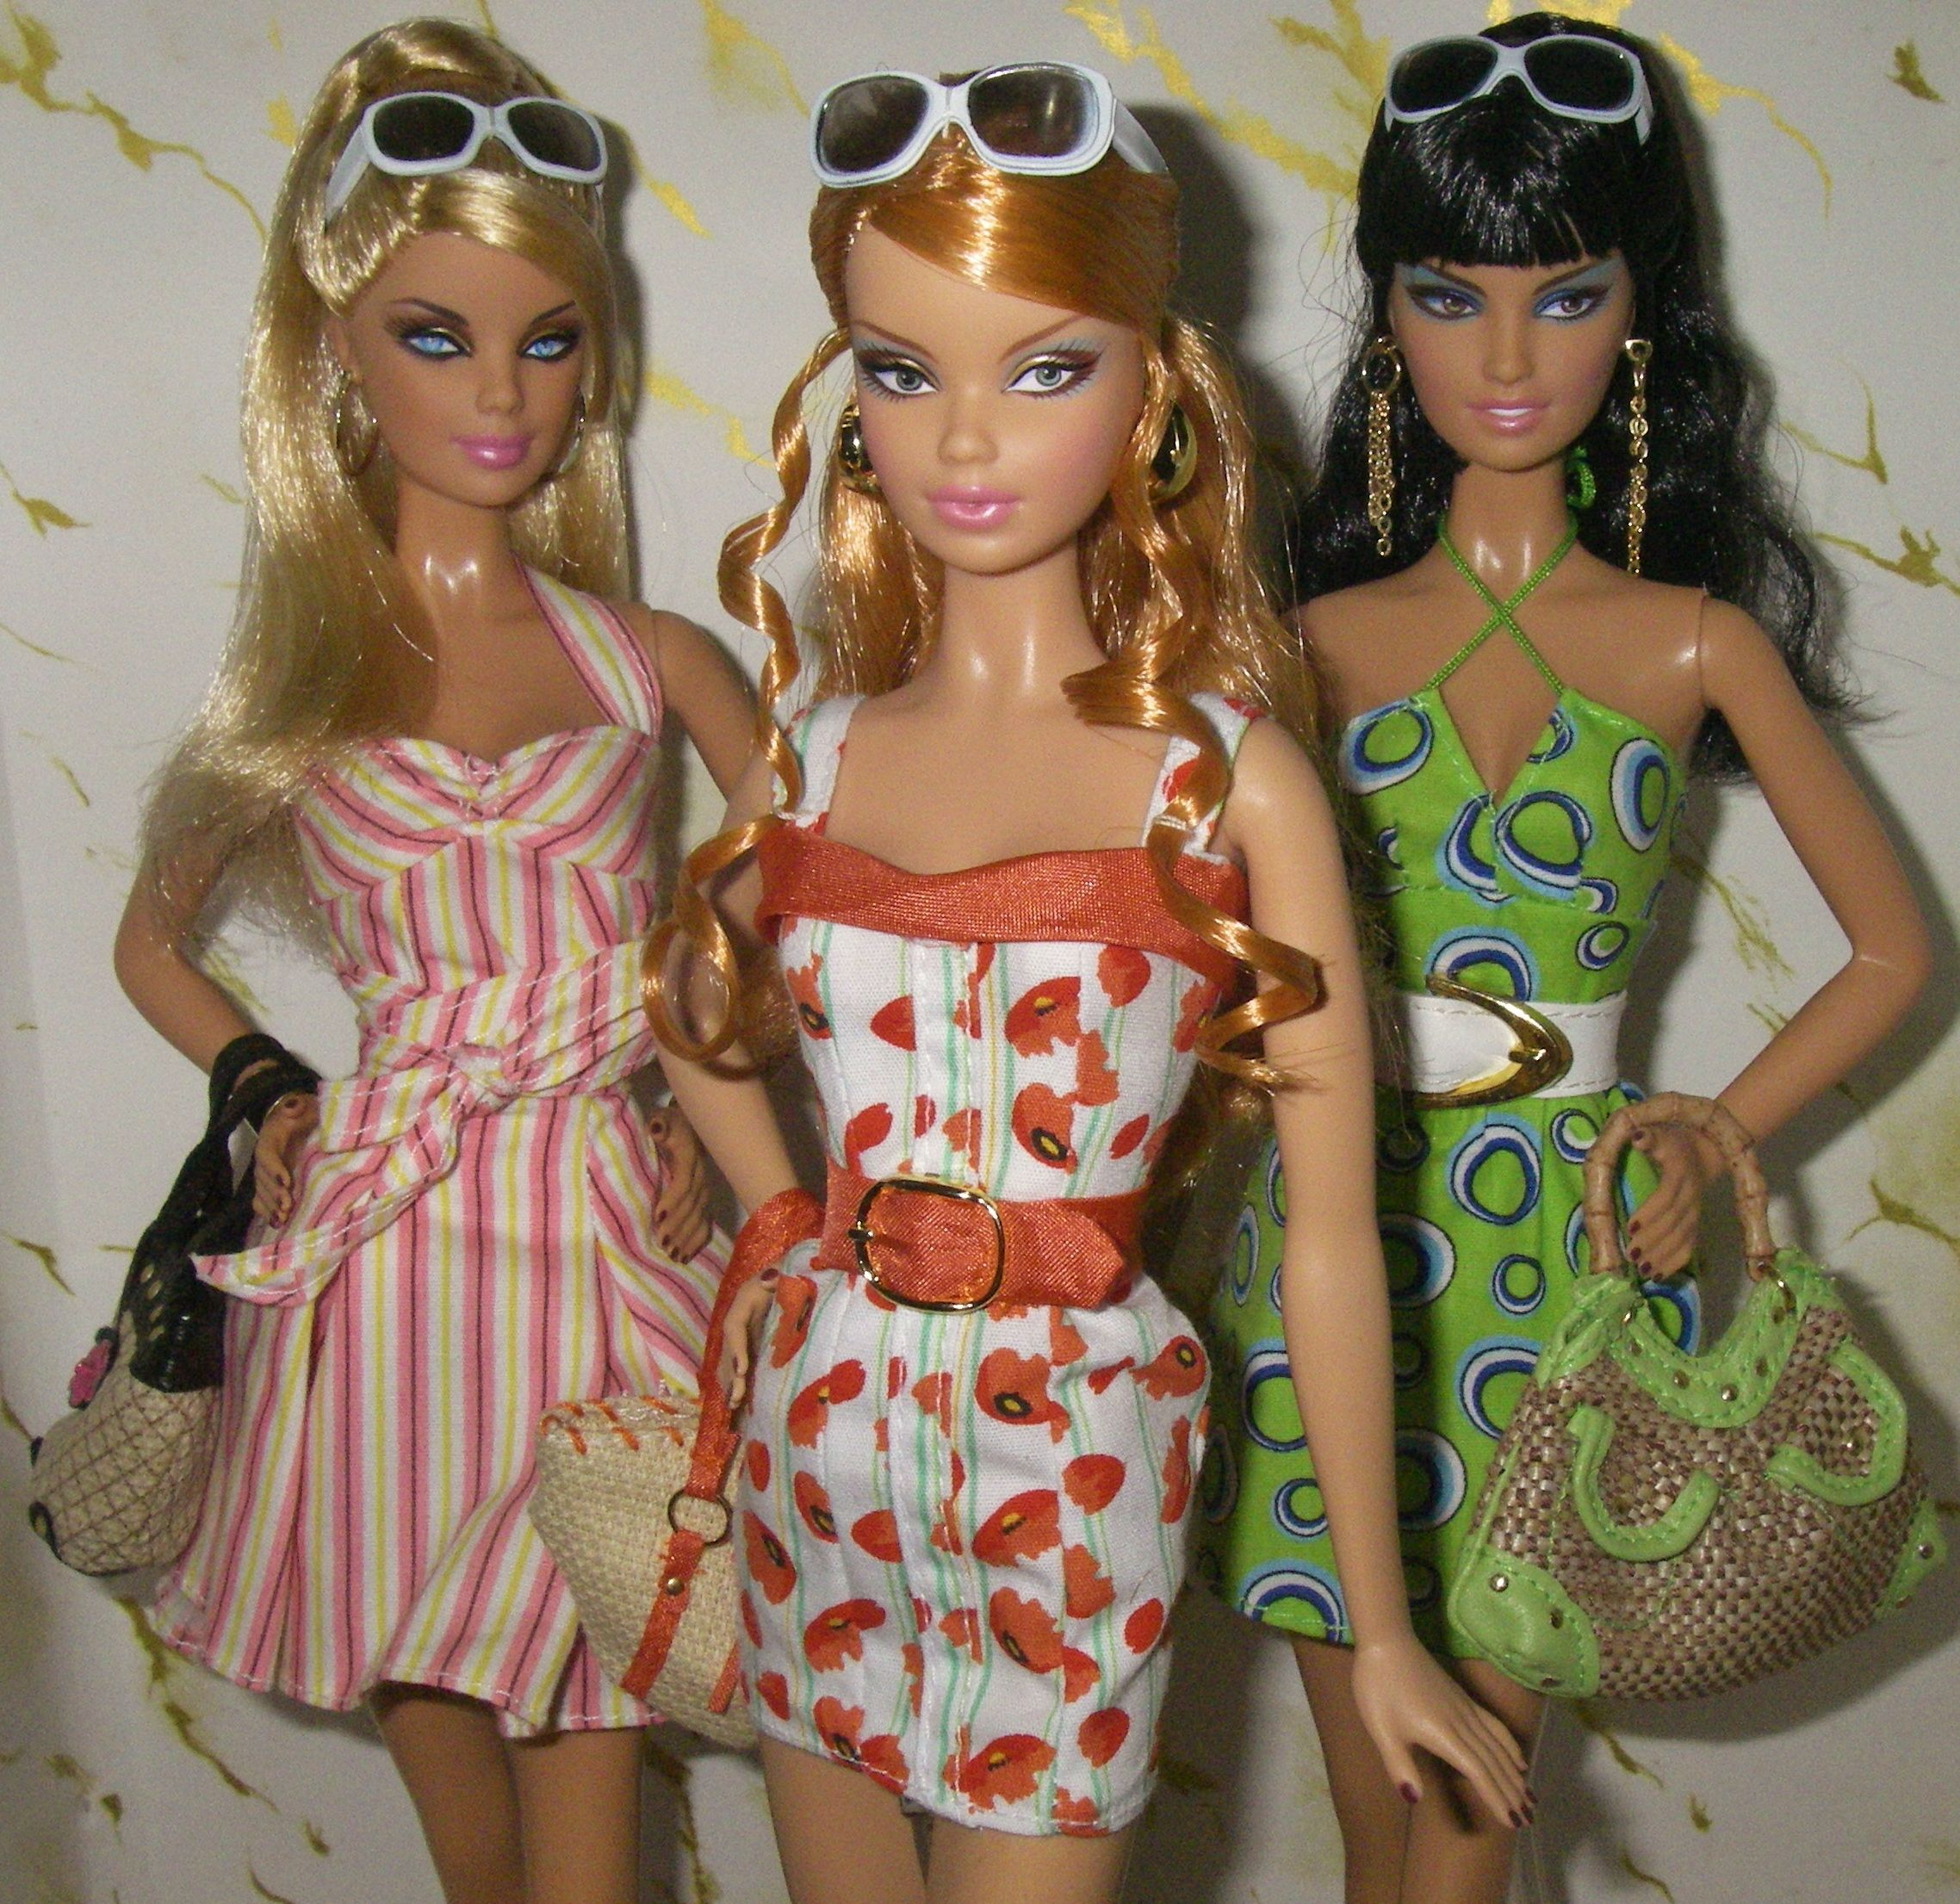 Barbie Top Model Resort Barbie Dress Barbie Top Barbie Clothes